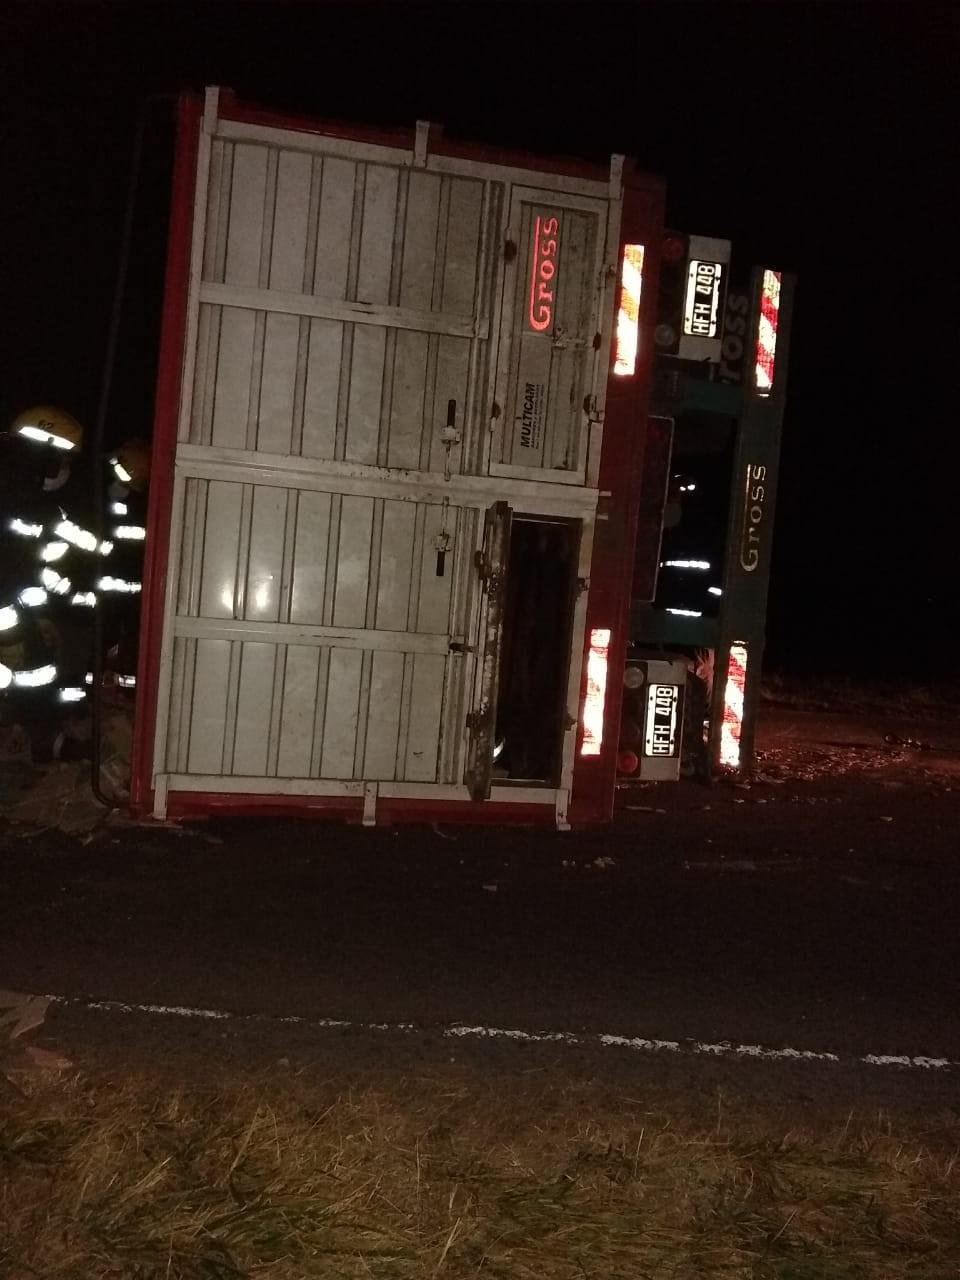 Ruta 205: Un camión volcó el acoplado que remolcaba a la altura de la bajada a Del Valle